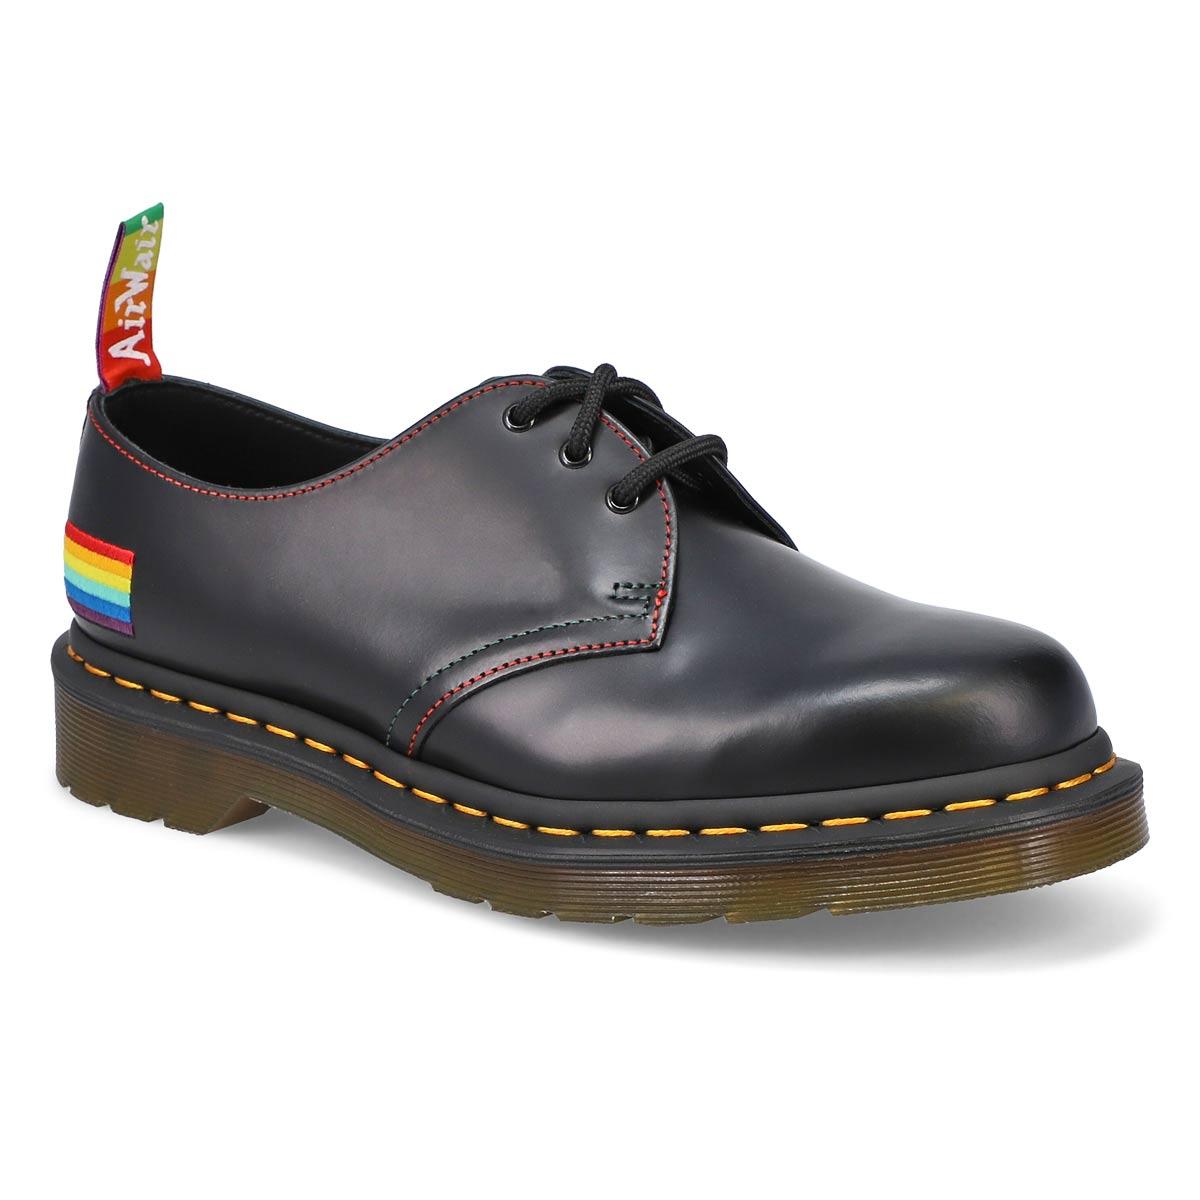 Women's 1461 Pride Shoe - Black